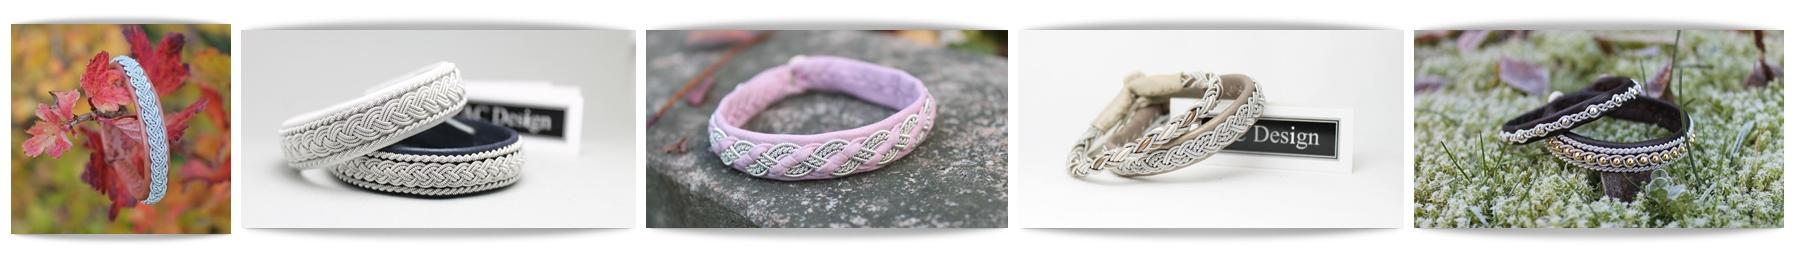 Handmade Saami armband - AC Design - Sweden